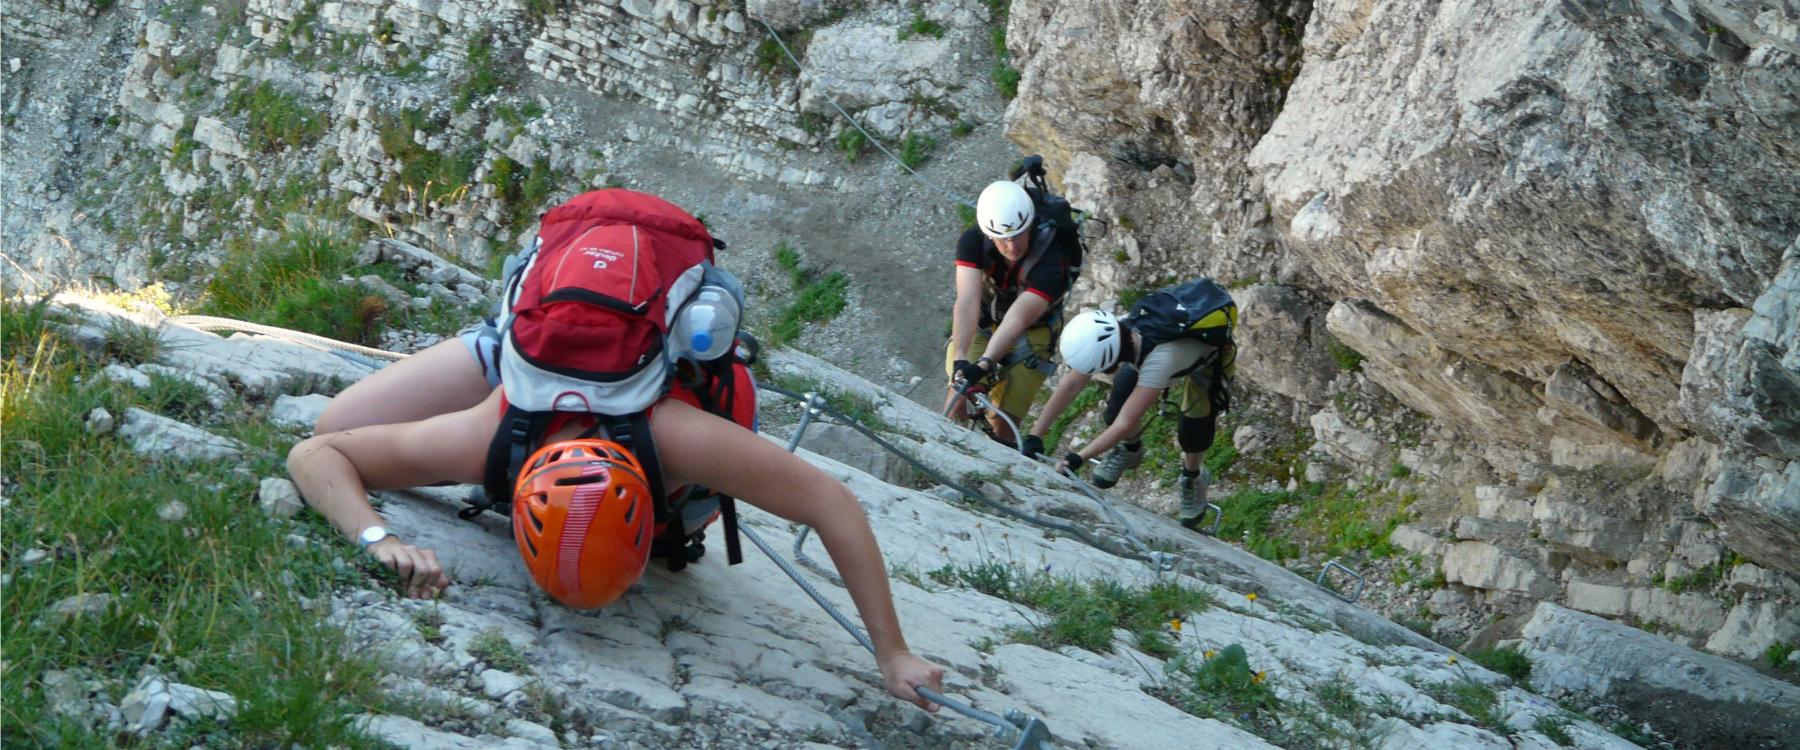 Rock Climbers Descending a Steep Rock Face 1800x750